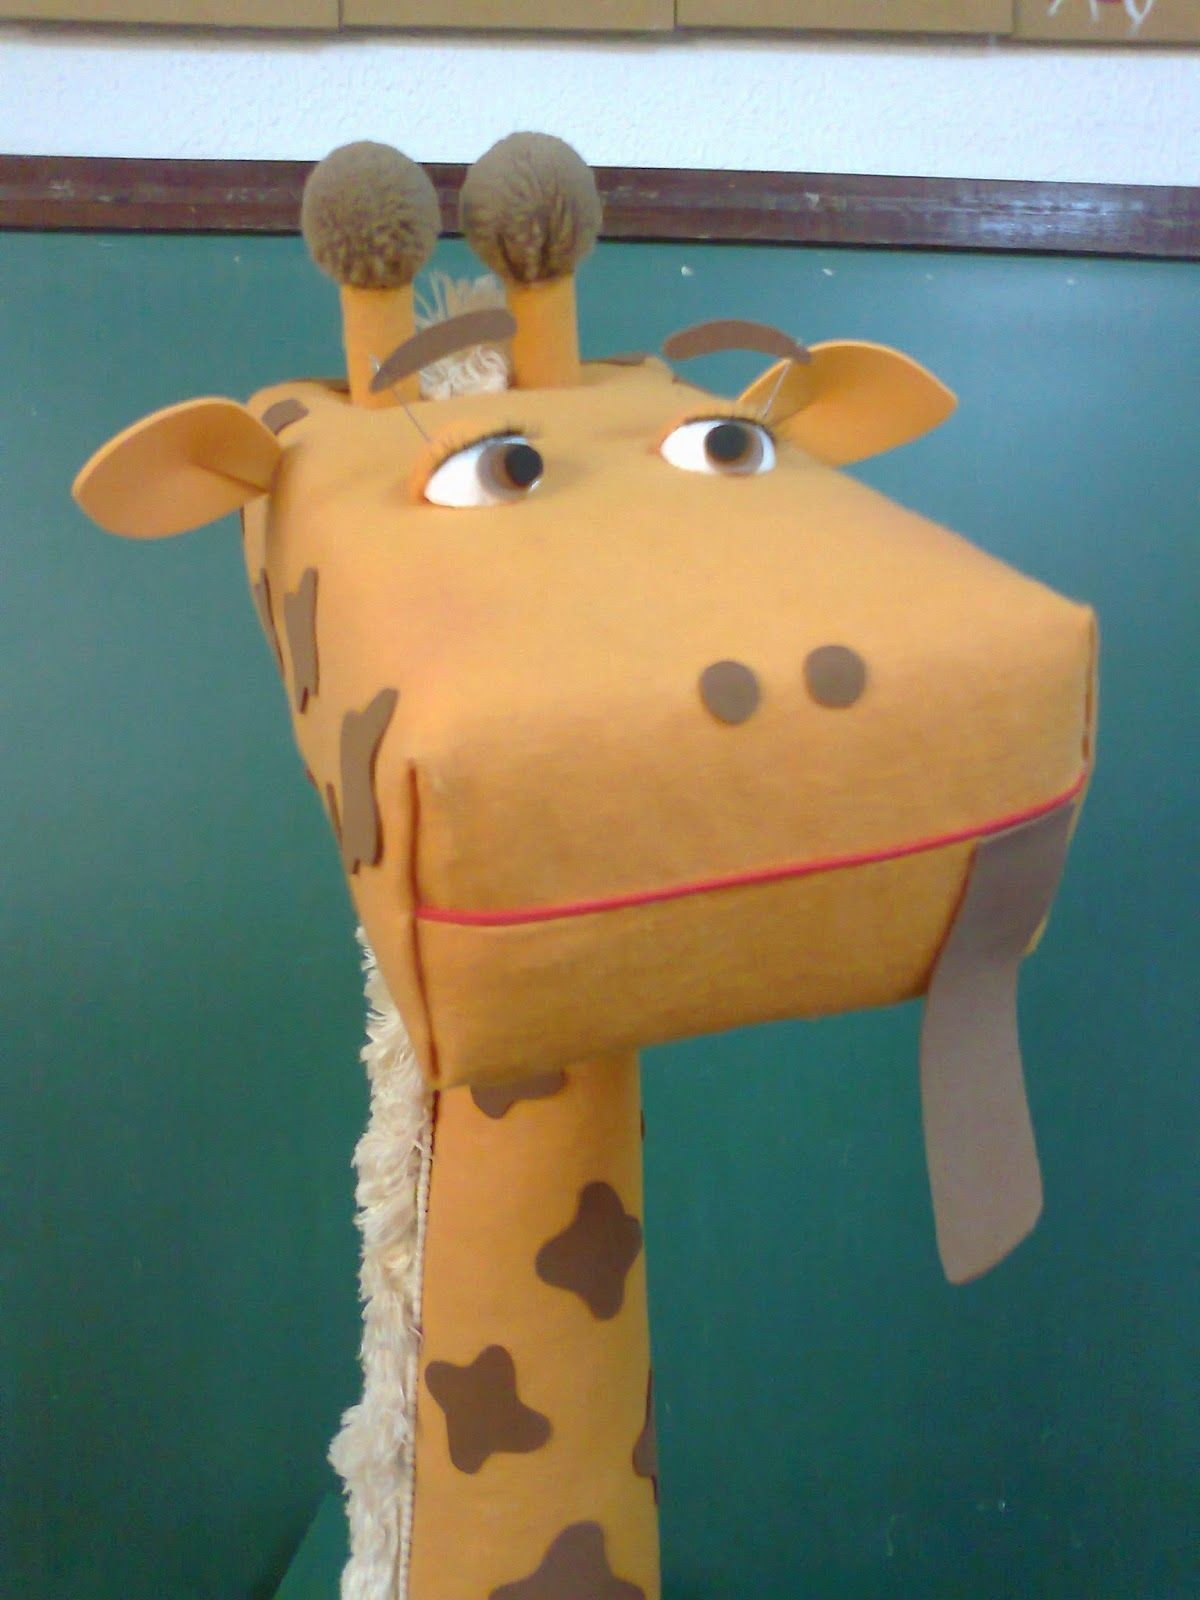 Uma ³tima ideia que serve o caixa de leitura A girafa poderá visitar as salas